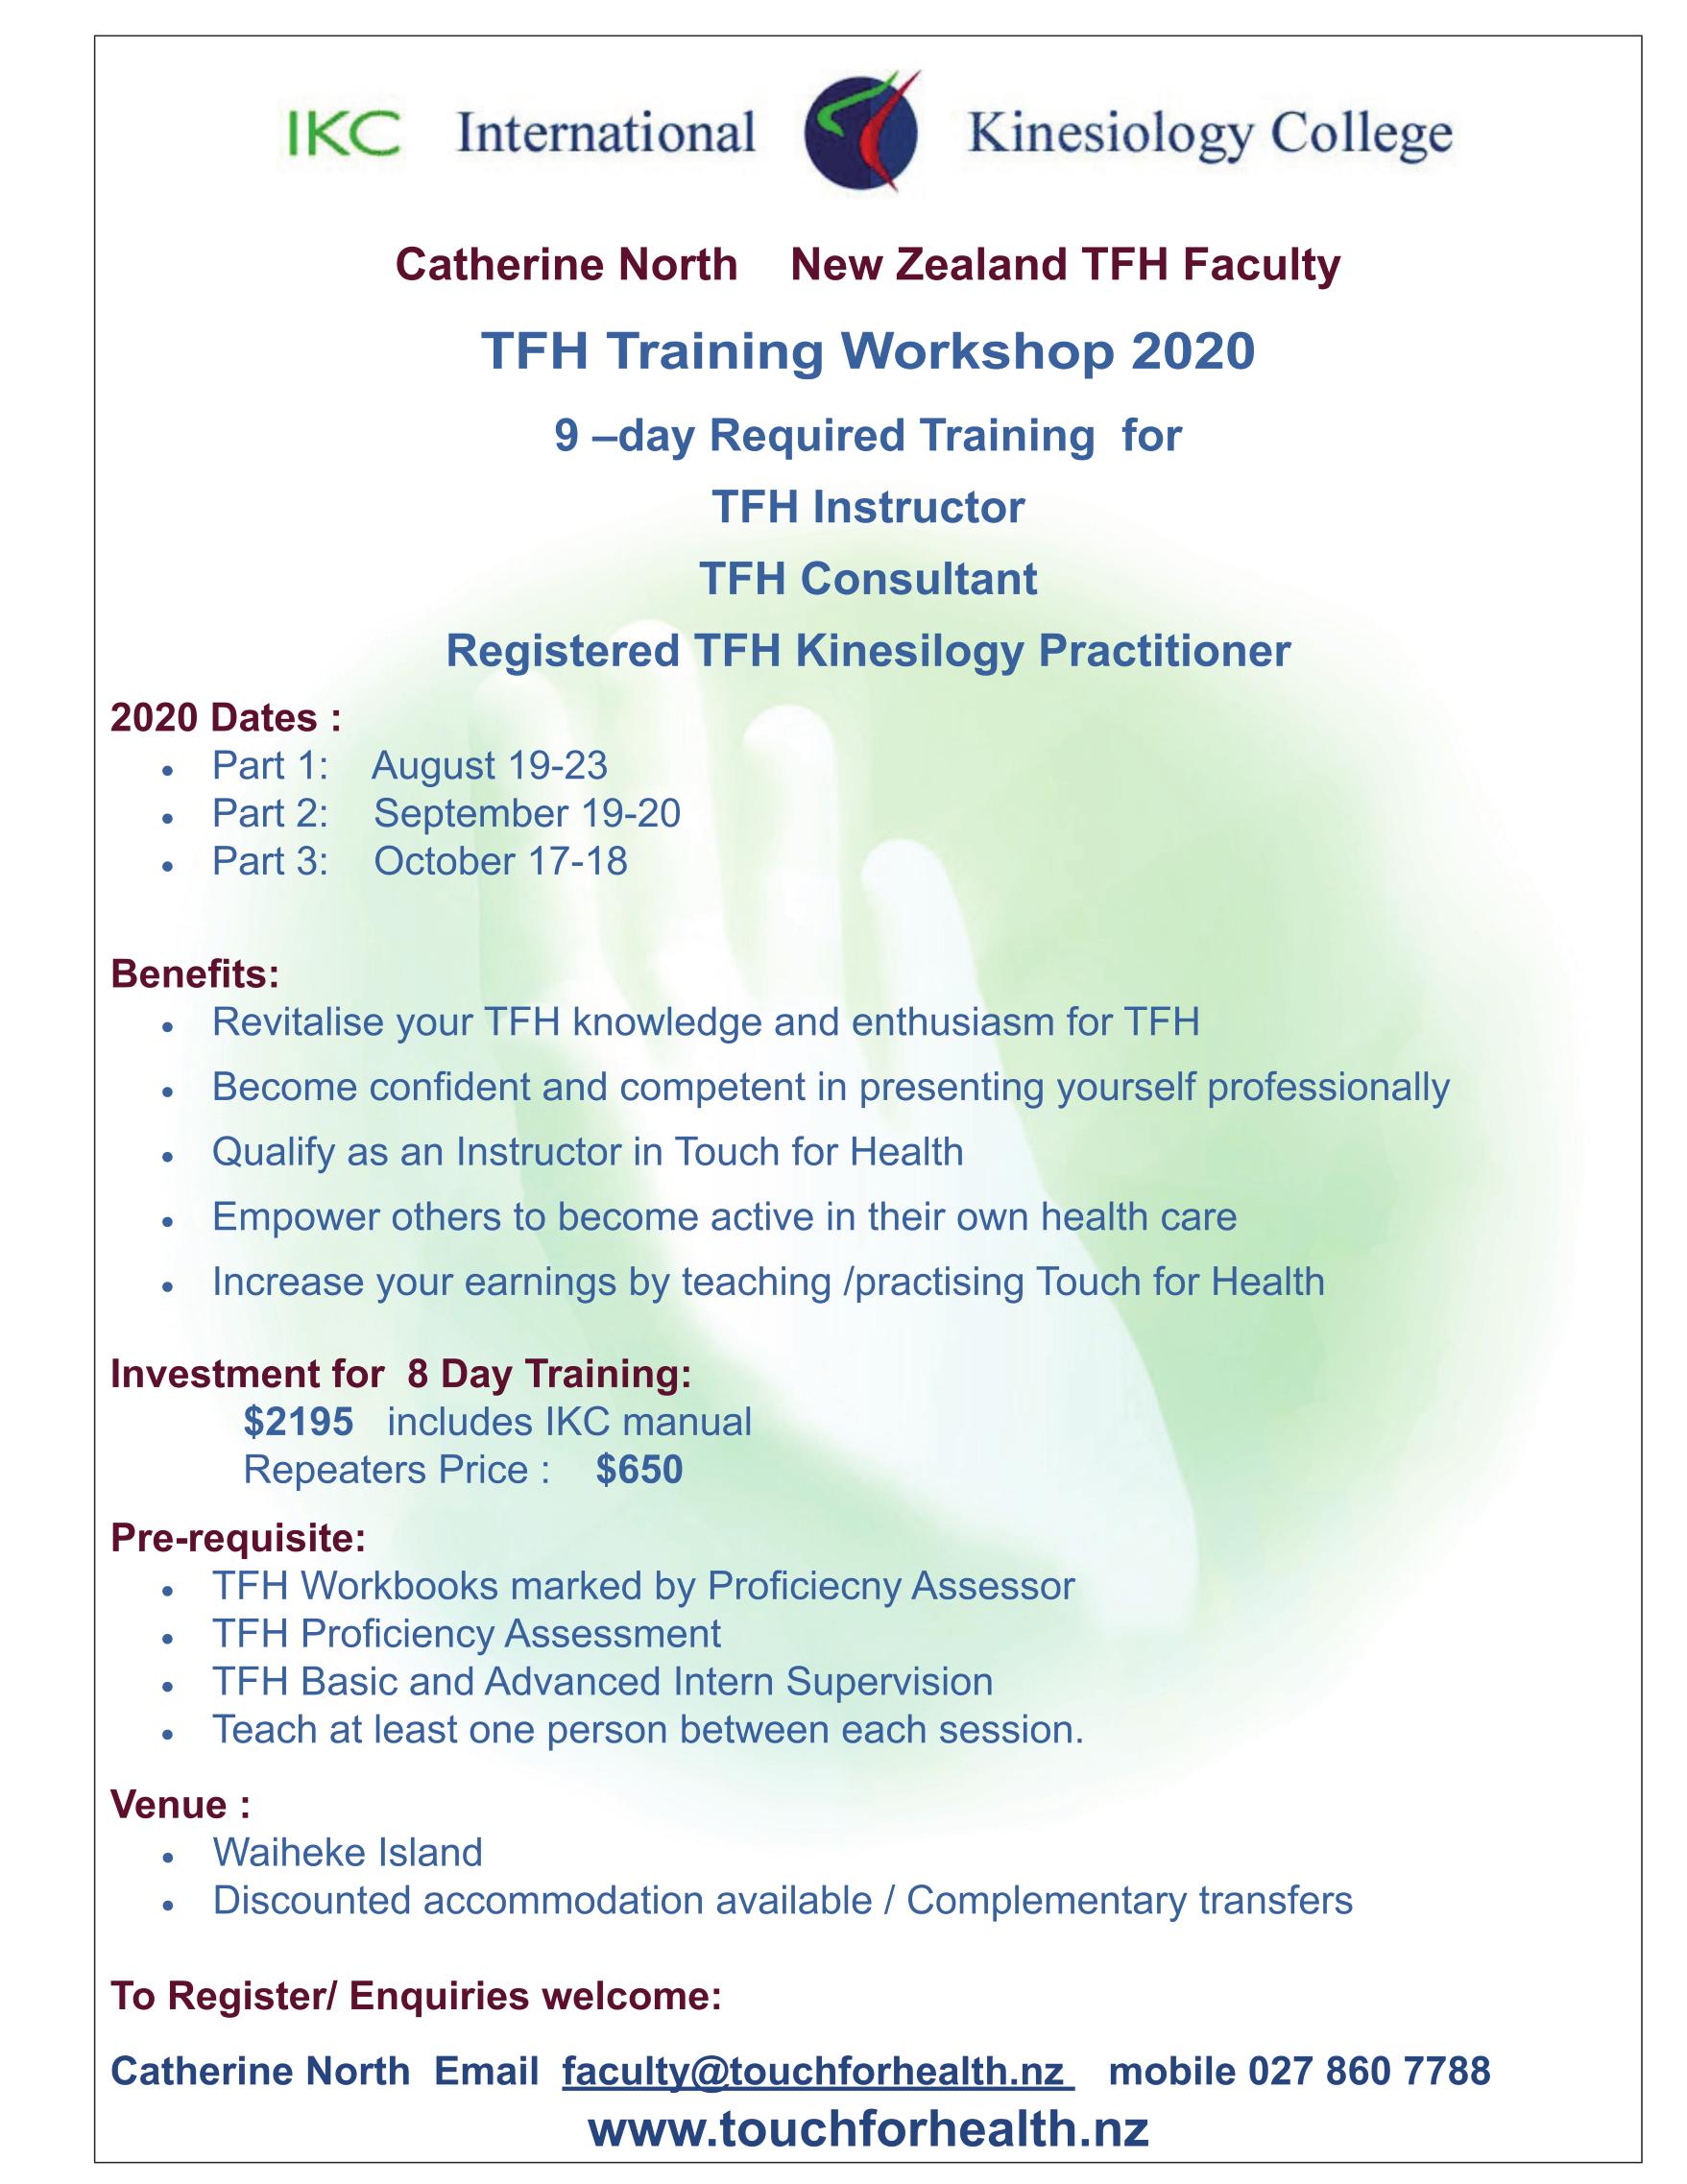 TFH Training Workshop 2020